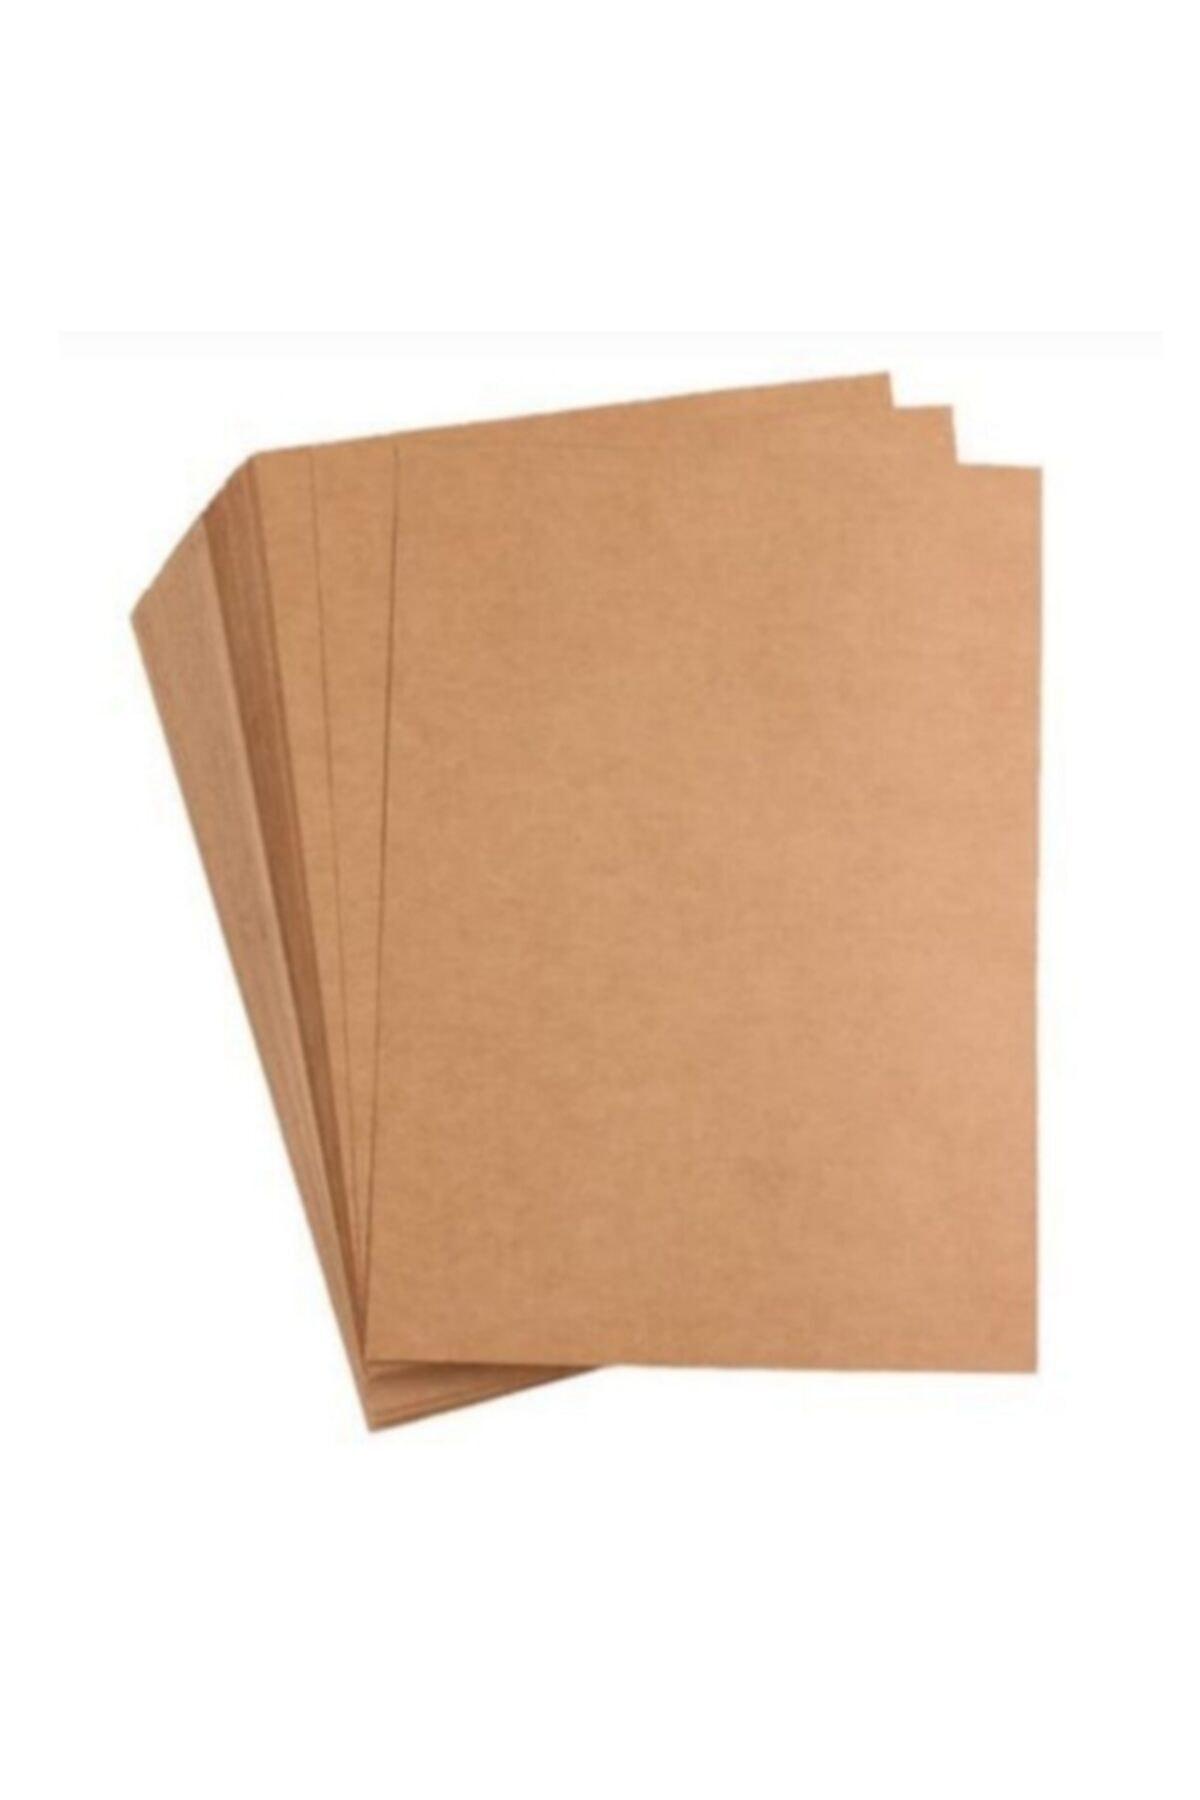 Ambalaj Atölyesi 115gr 40x50cm Baskısız (200 ADET) Kraft Kağıt Oto Paspas 1